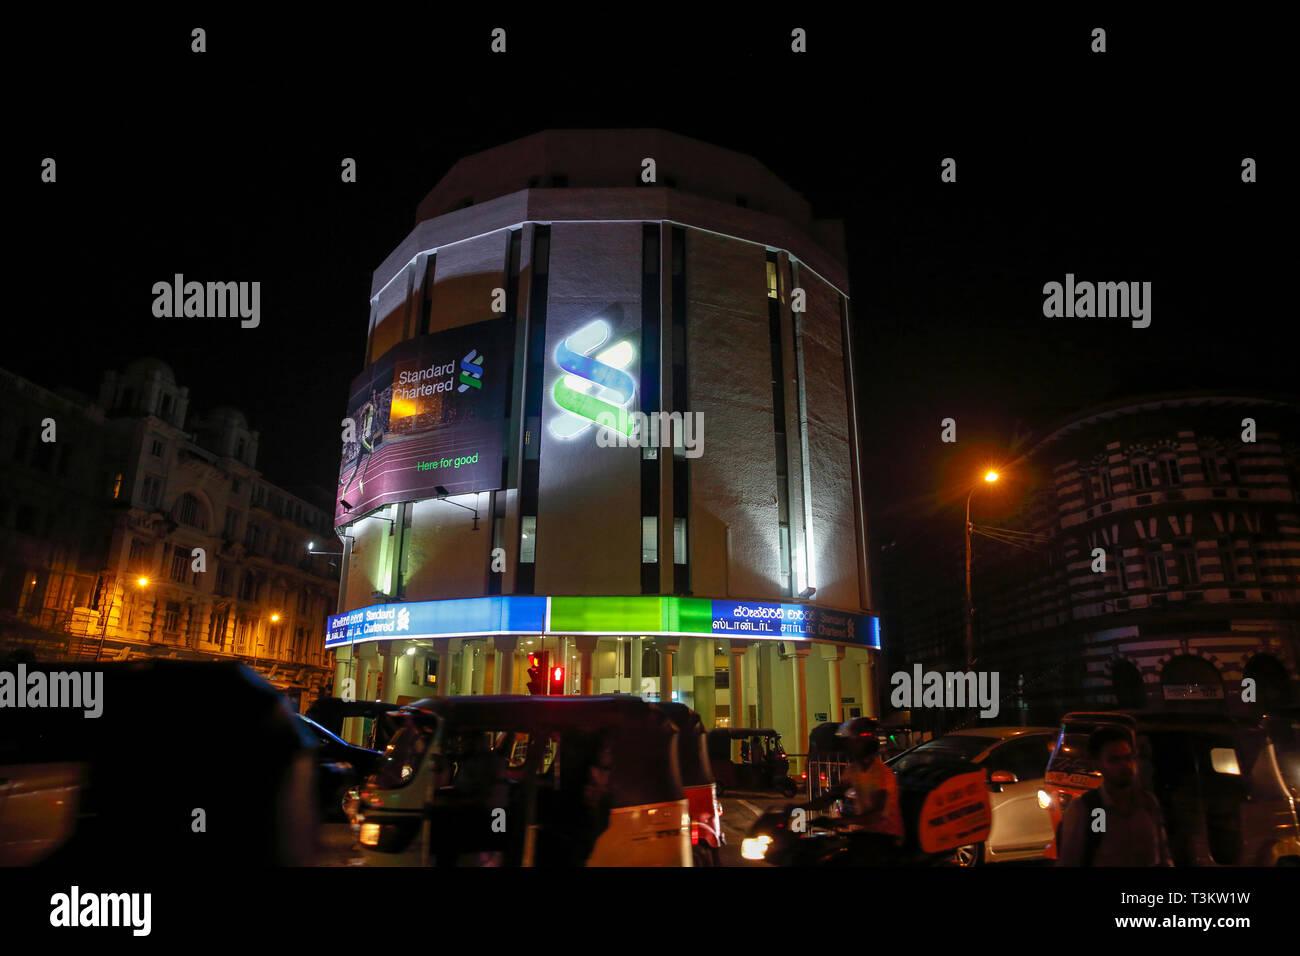 Standard Chartered Bank building in Colombo, Sri Lanka Stock Photo